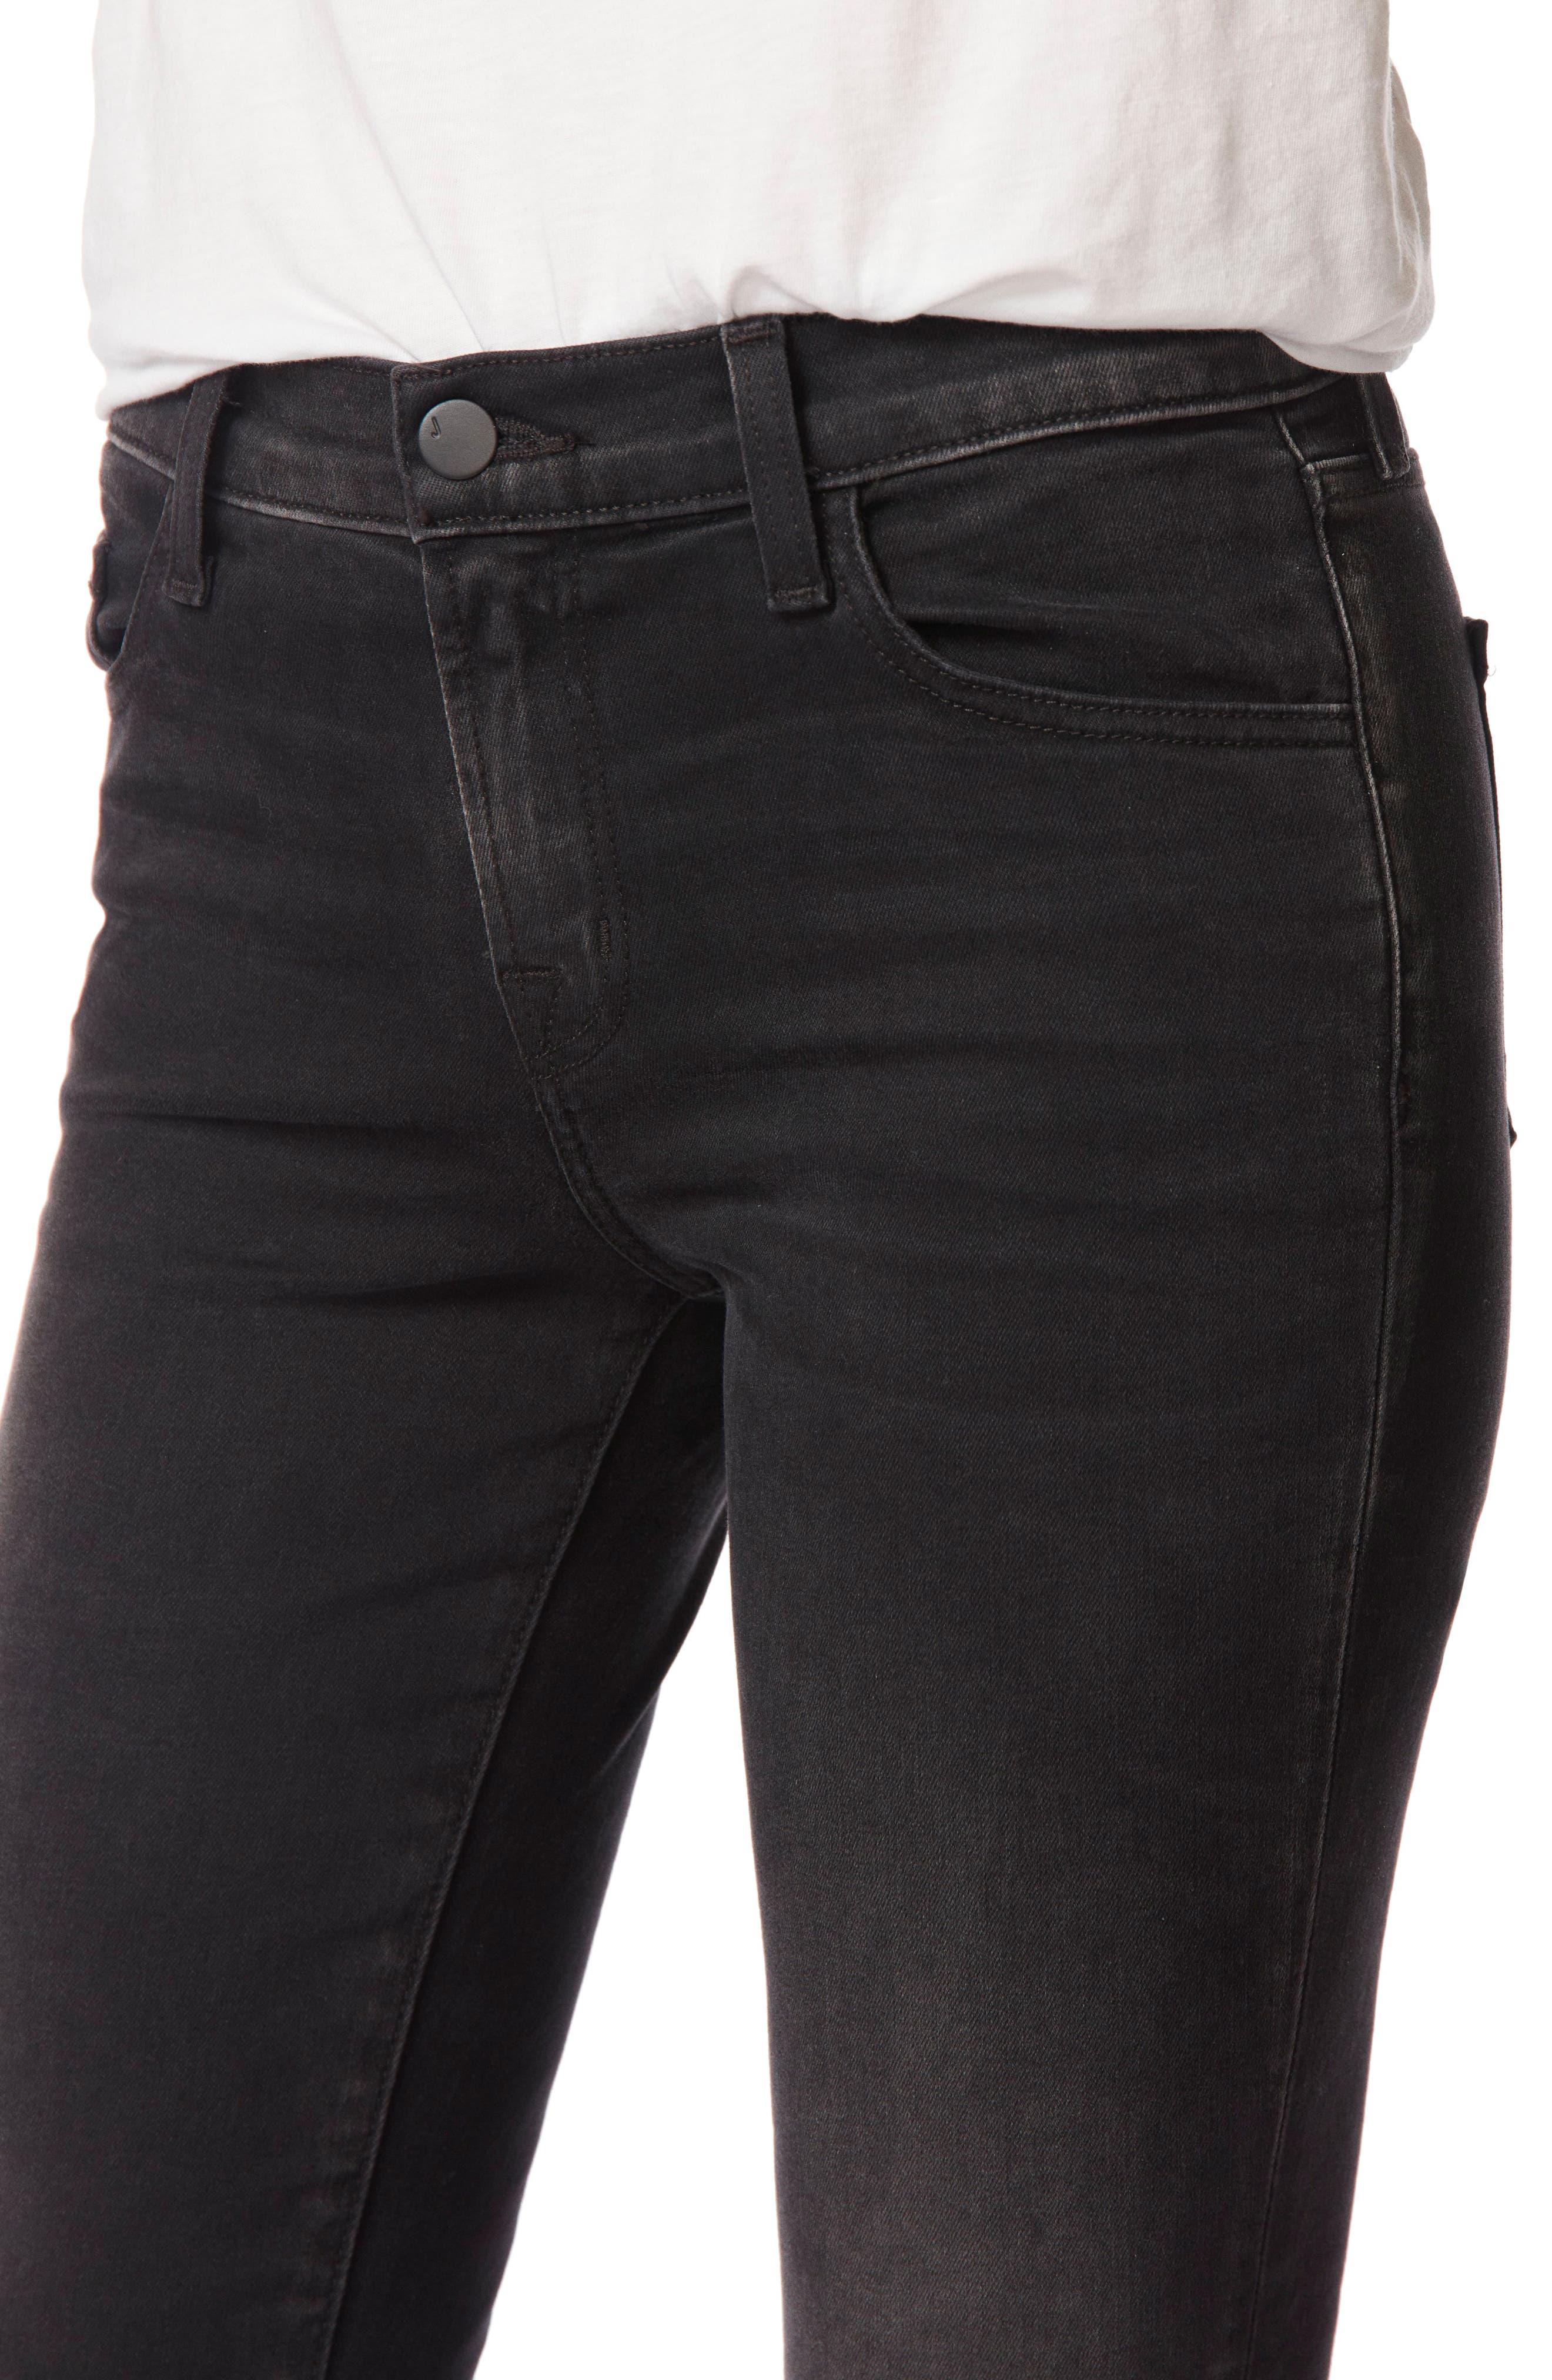 Capri Skinny Jeans,                             Alternate thumbnail 4, color,                             001